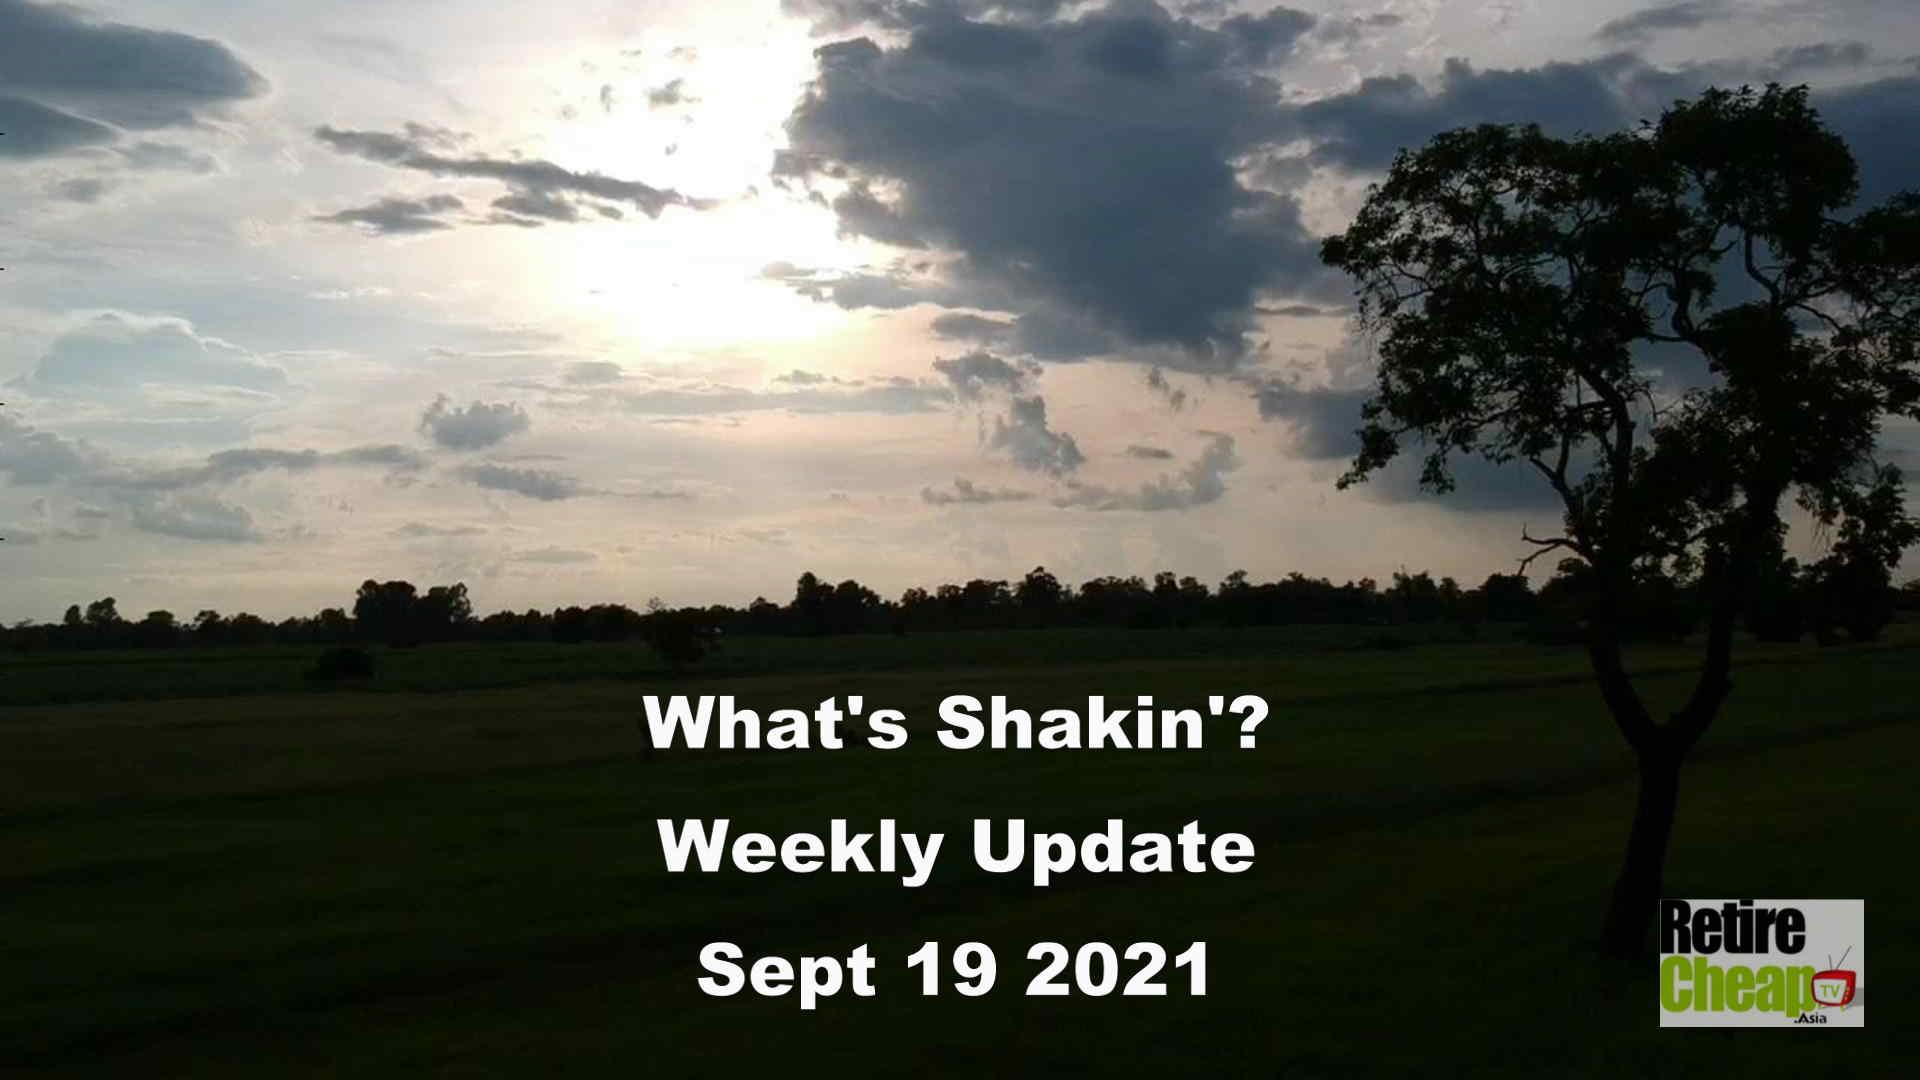 What's Shakn'? Week September 19 2021